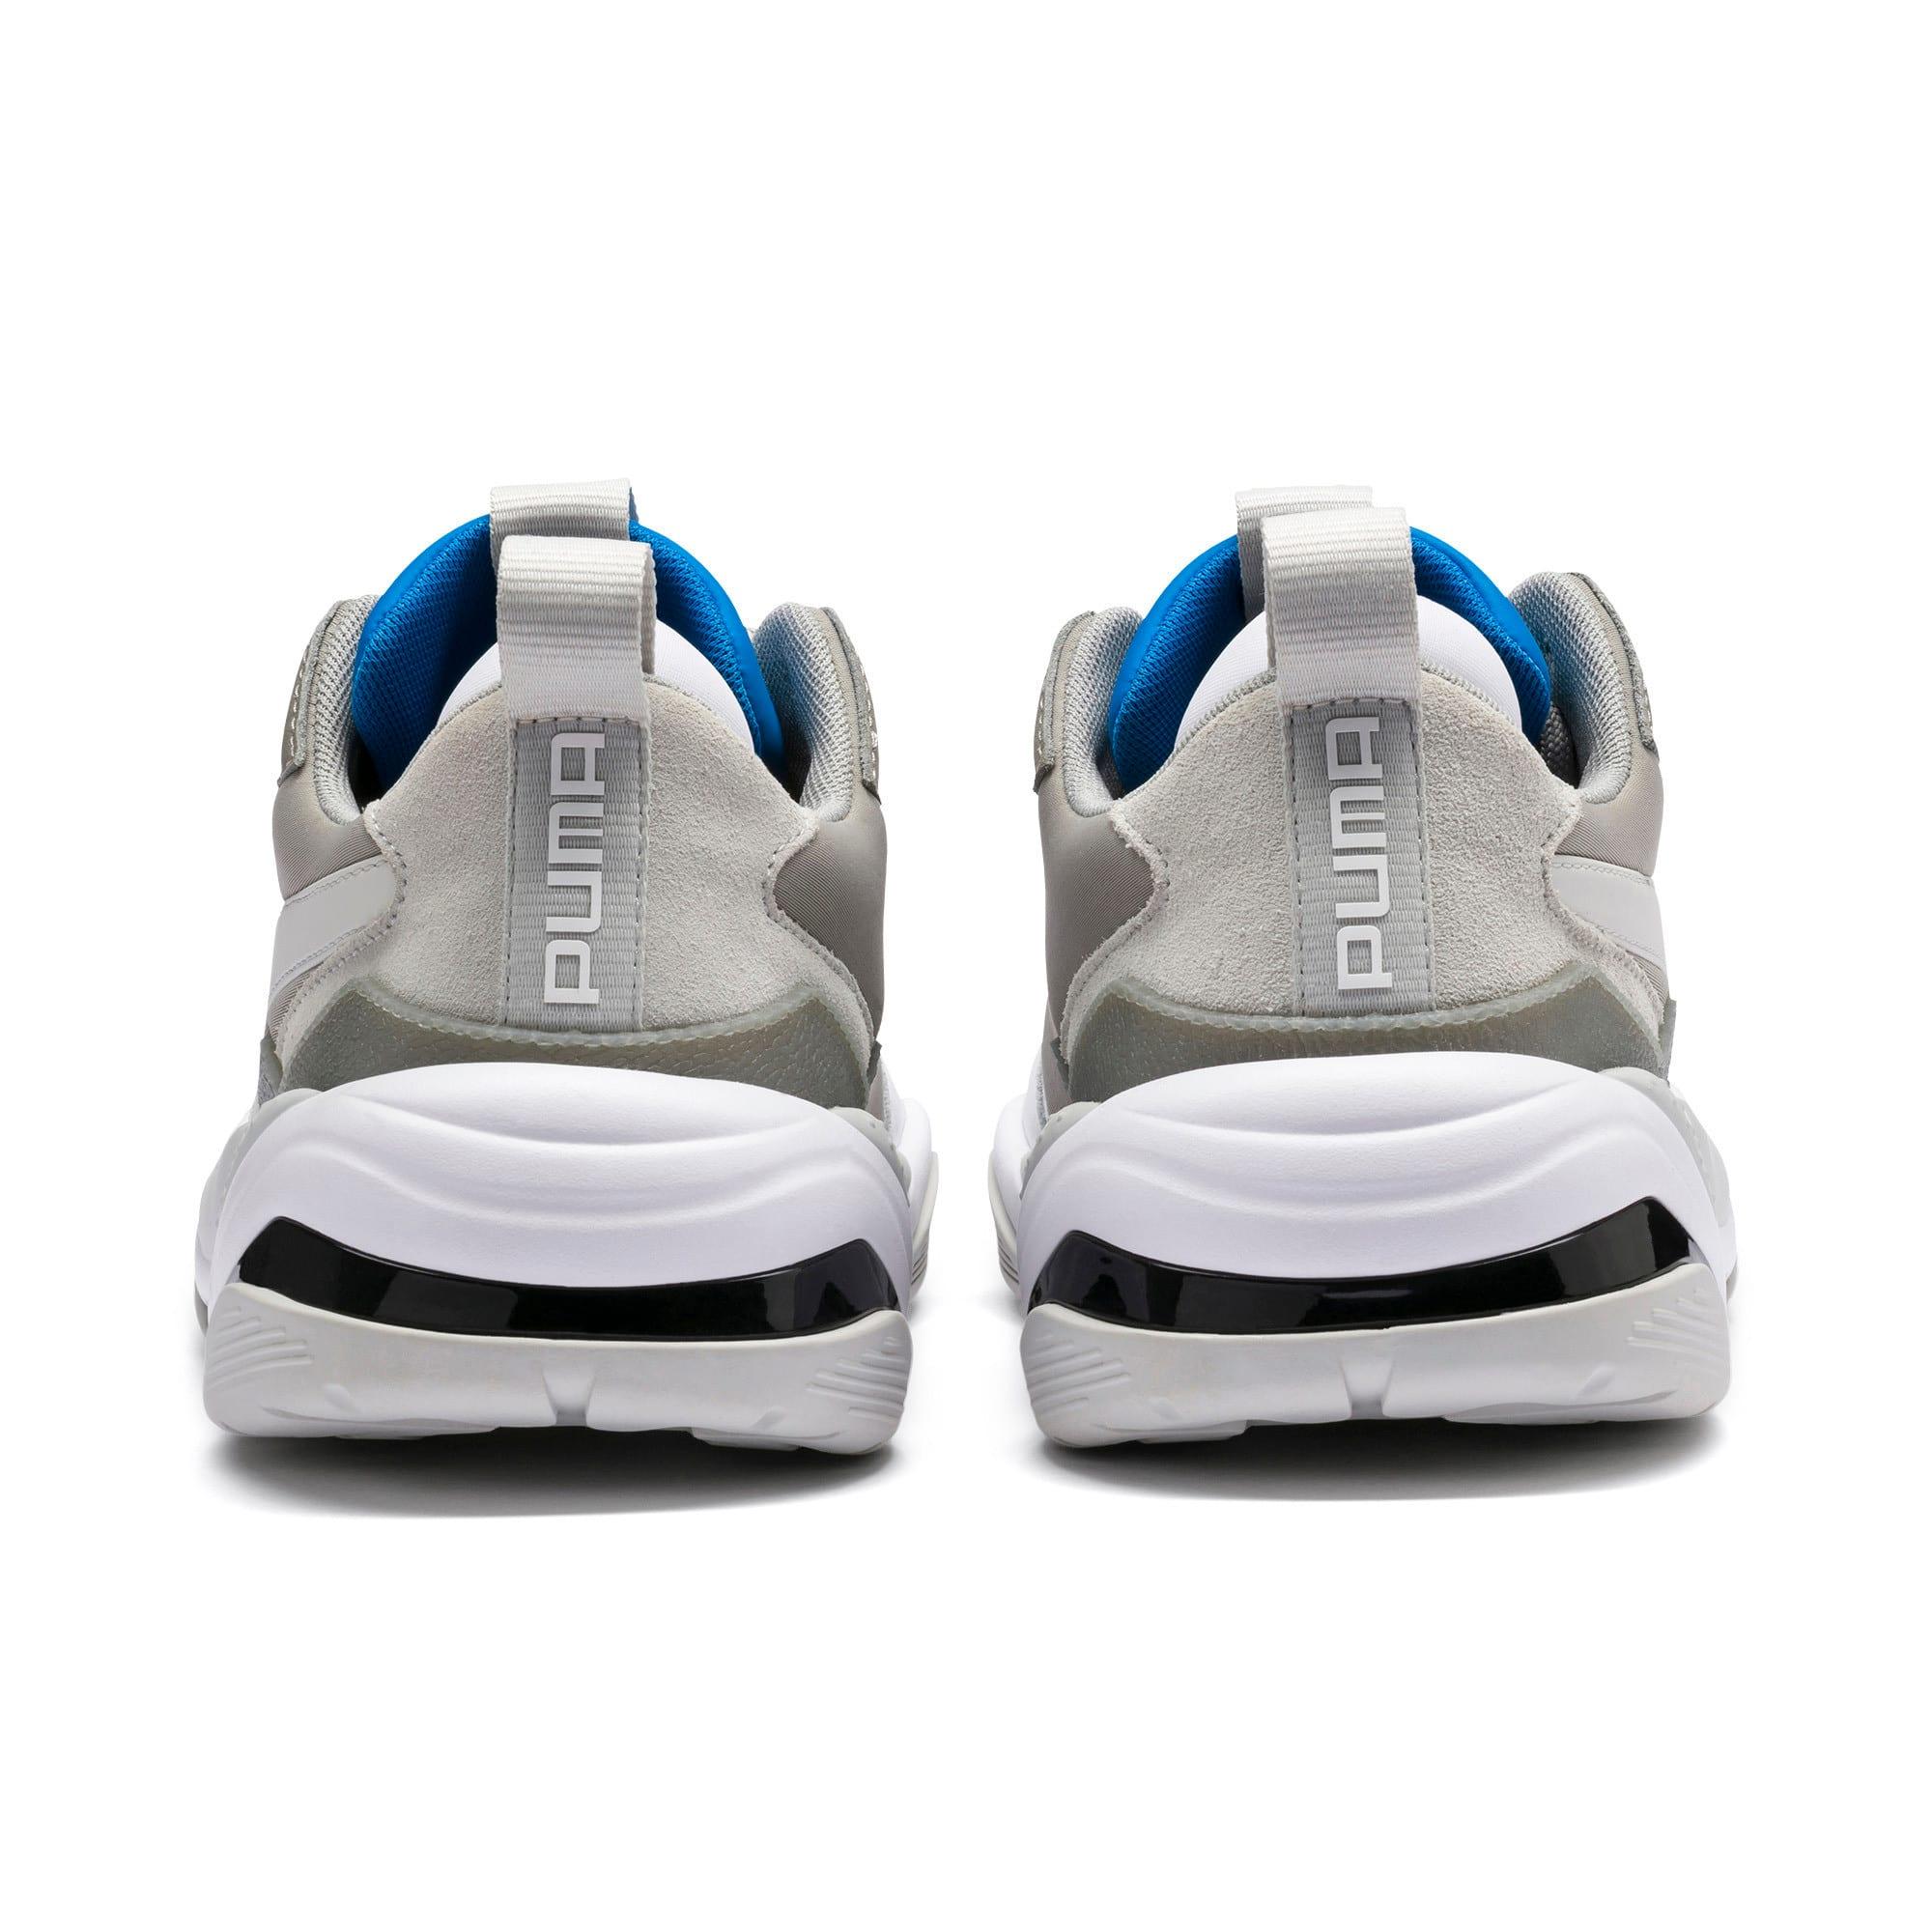 Thumbnail 3 of Sneakers Thunder Spectra, Glacier Gray-Indigo Bunting, medium